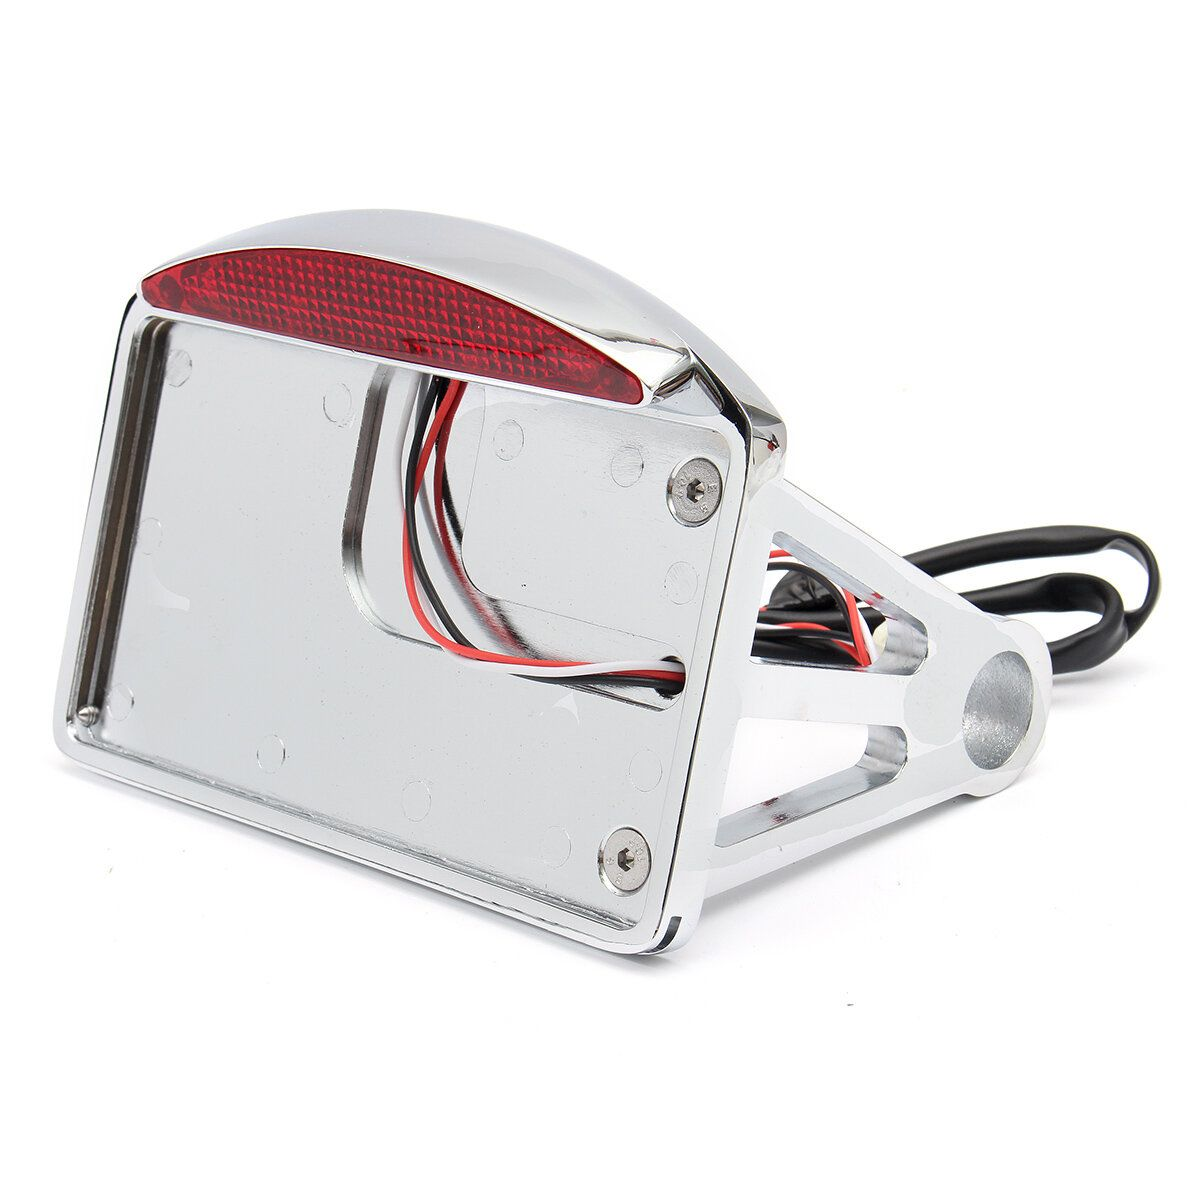 Motorcycle License Plate LED Tail Light Horizontal SidE mount Bracket For Harley